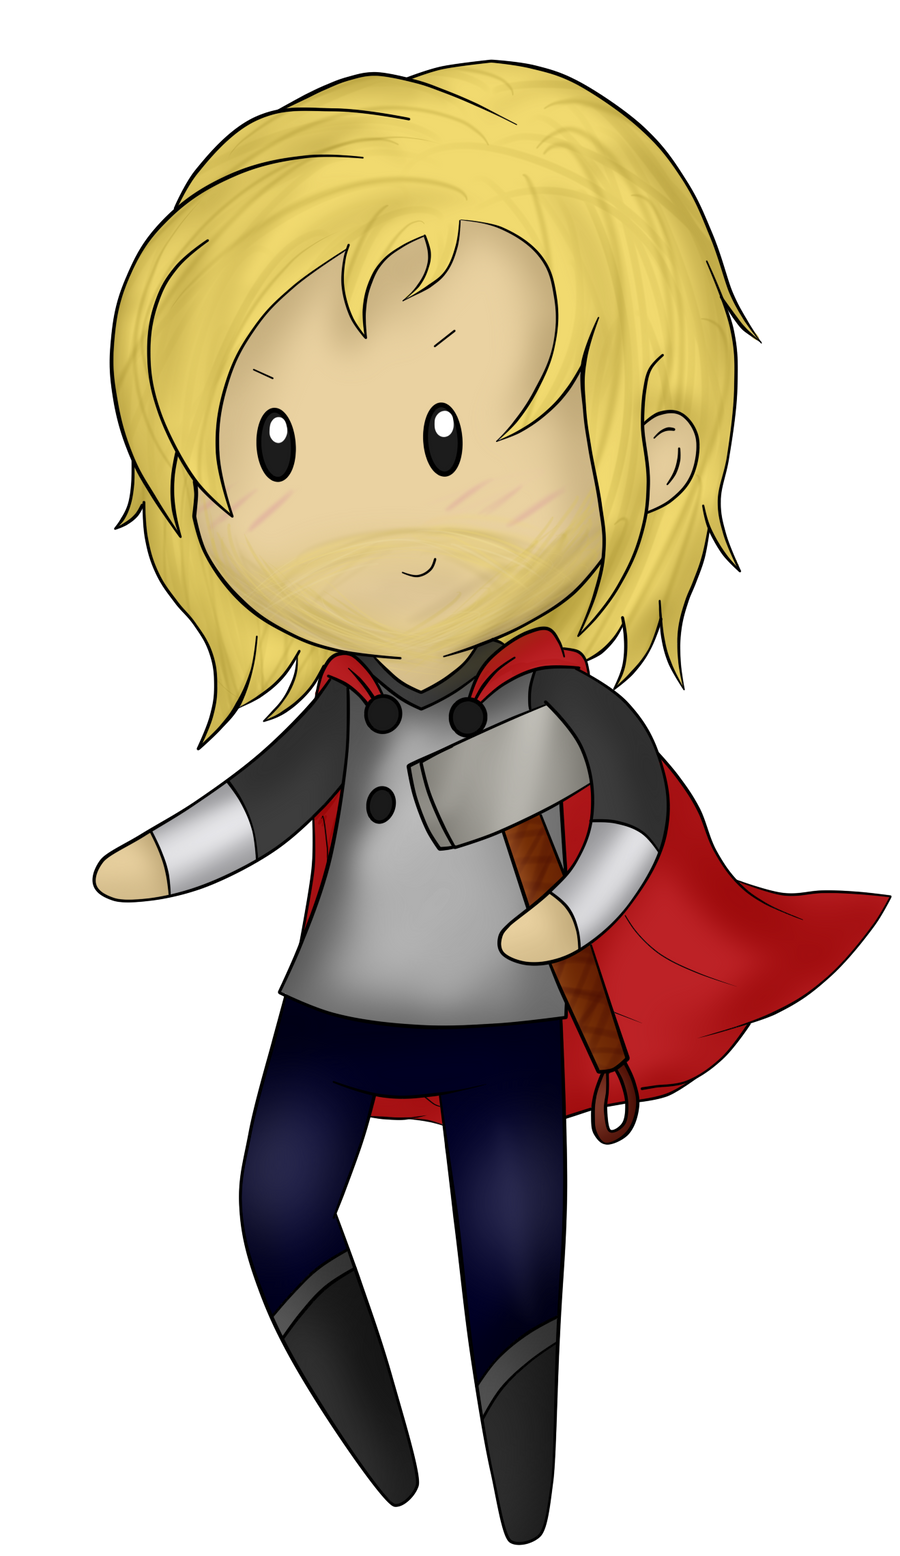 Chibi Thor by sharkcastic on DeviantArt